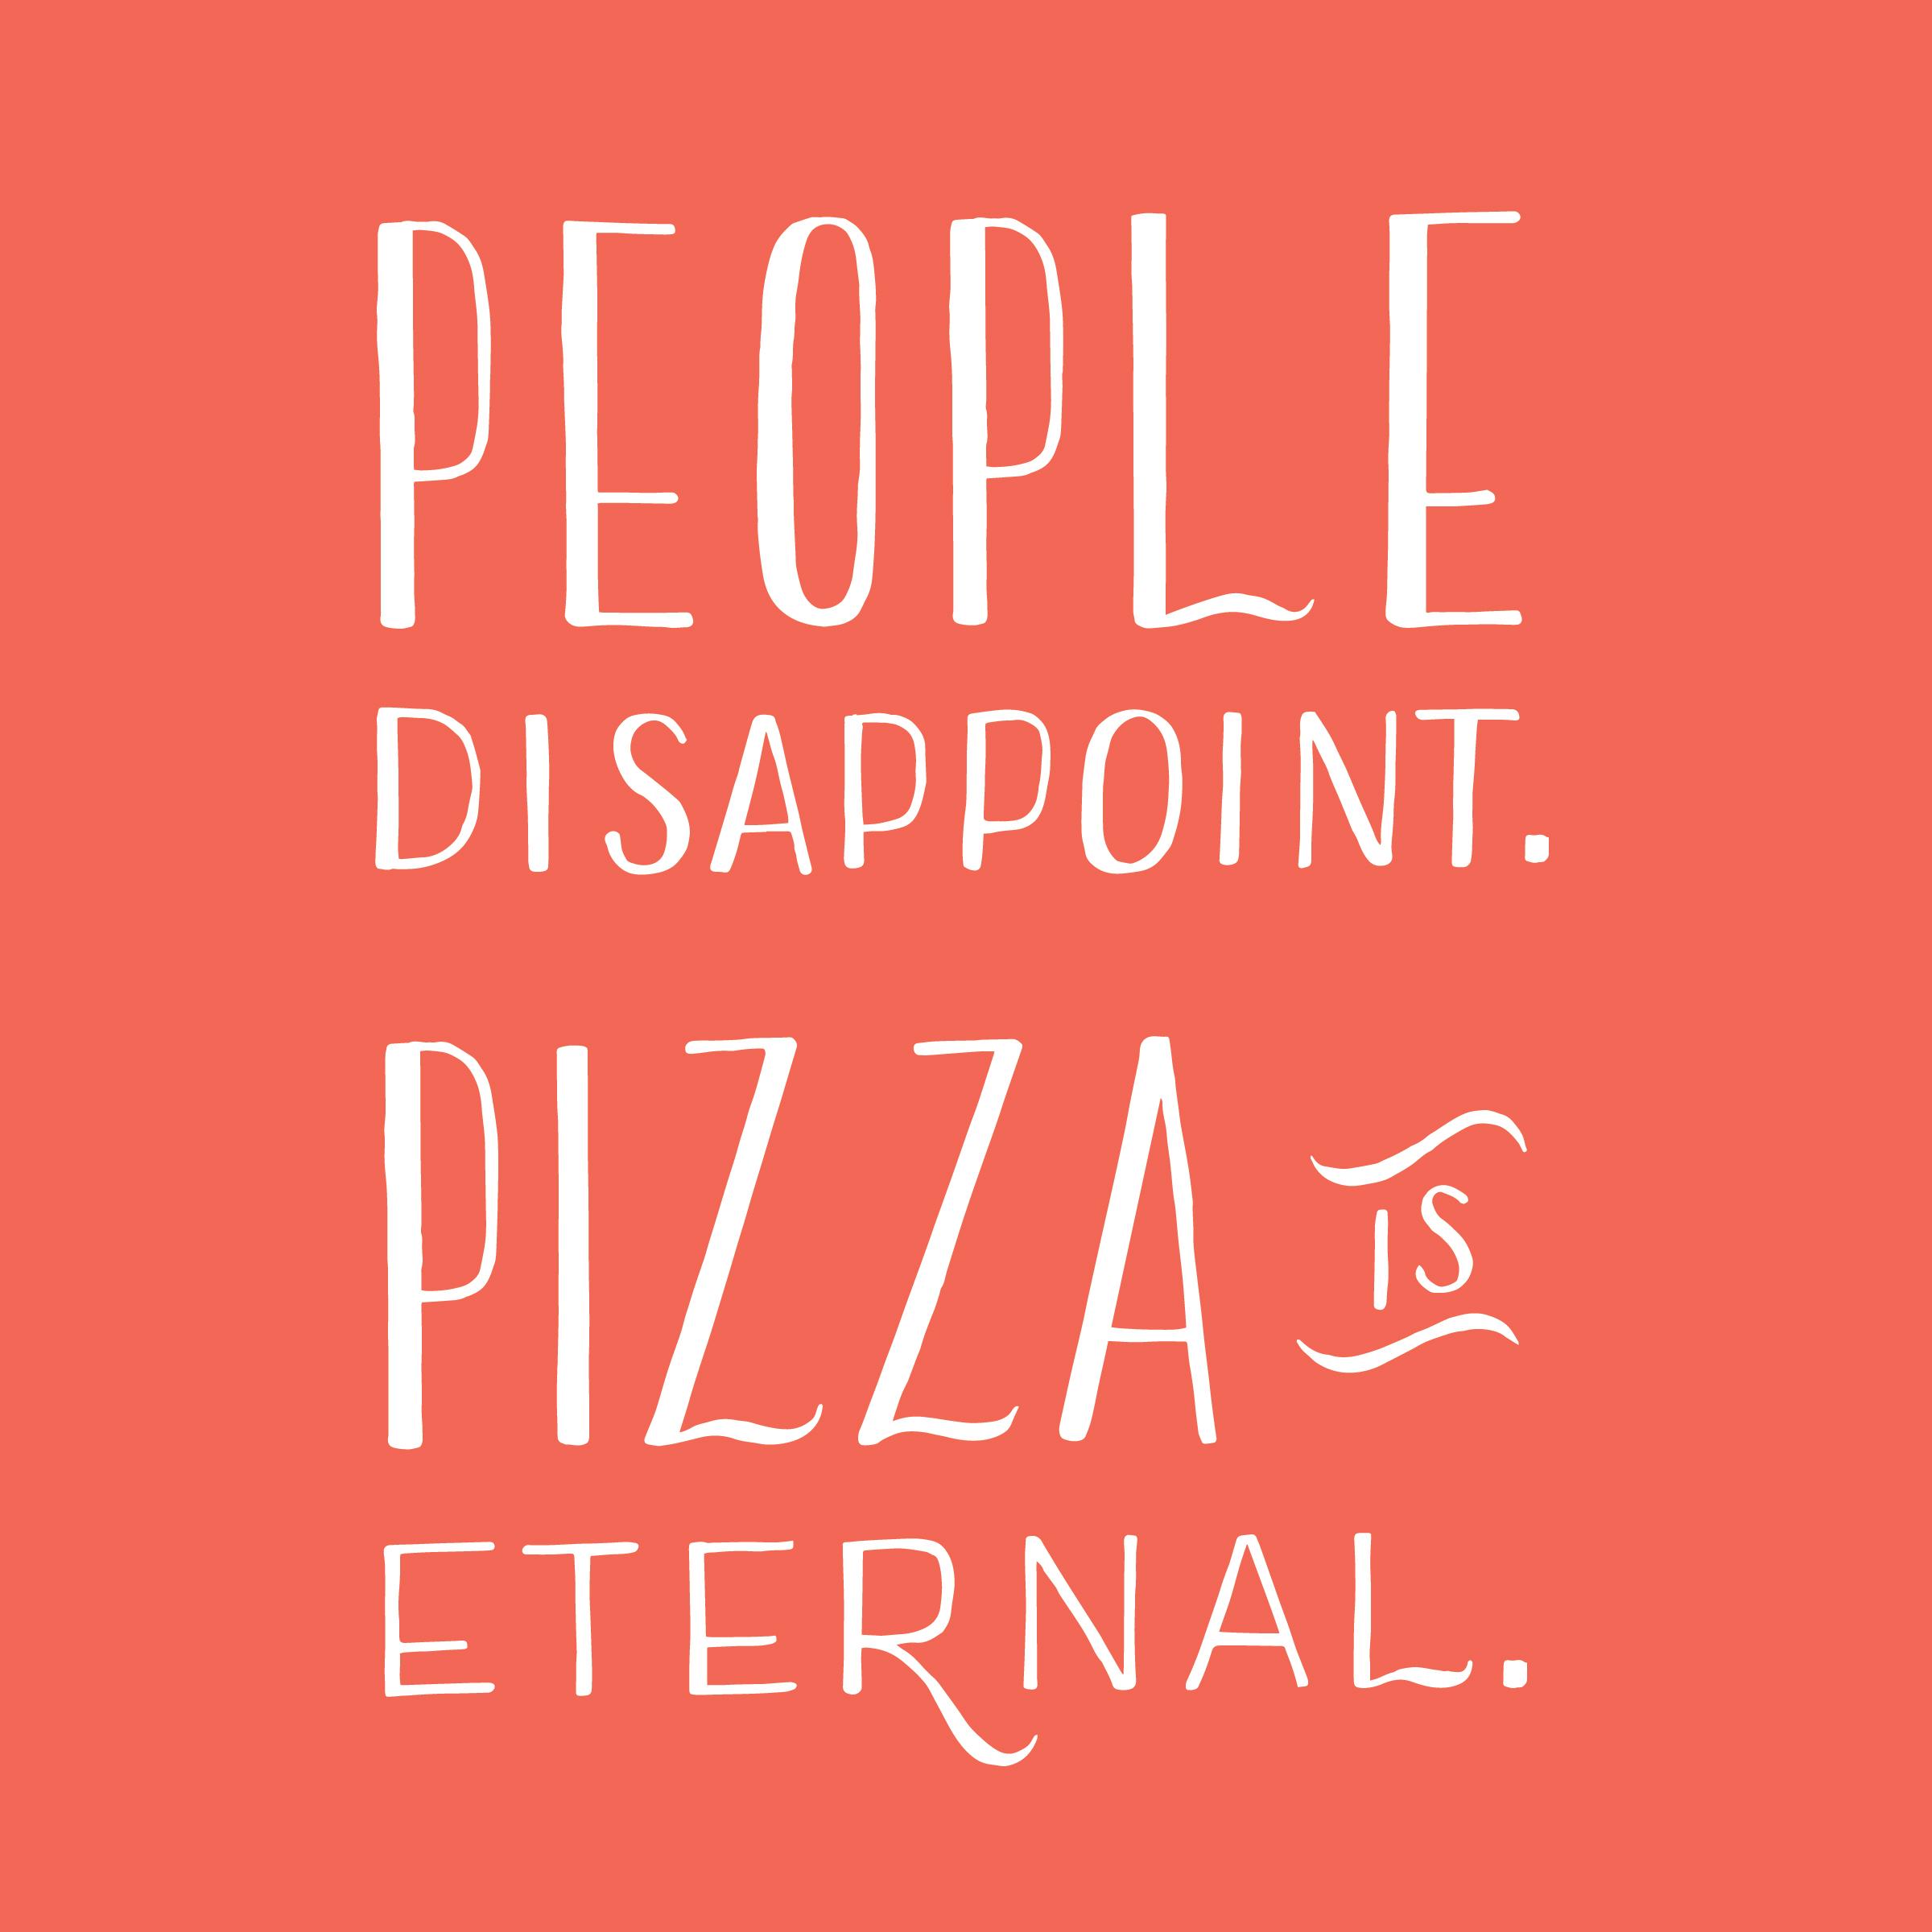 Pizza Is Eternal - andreacrofts.com.jpg